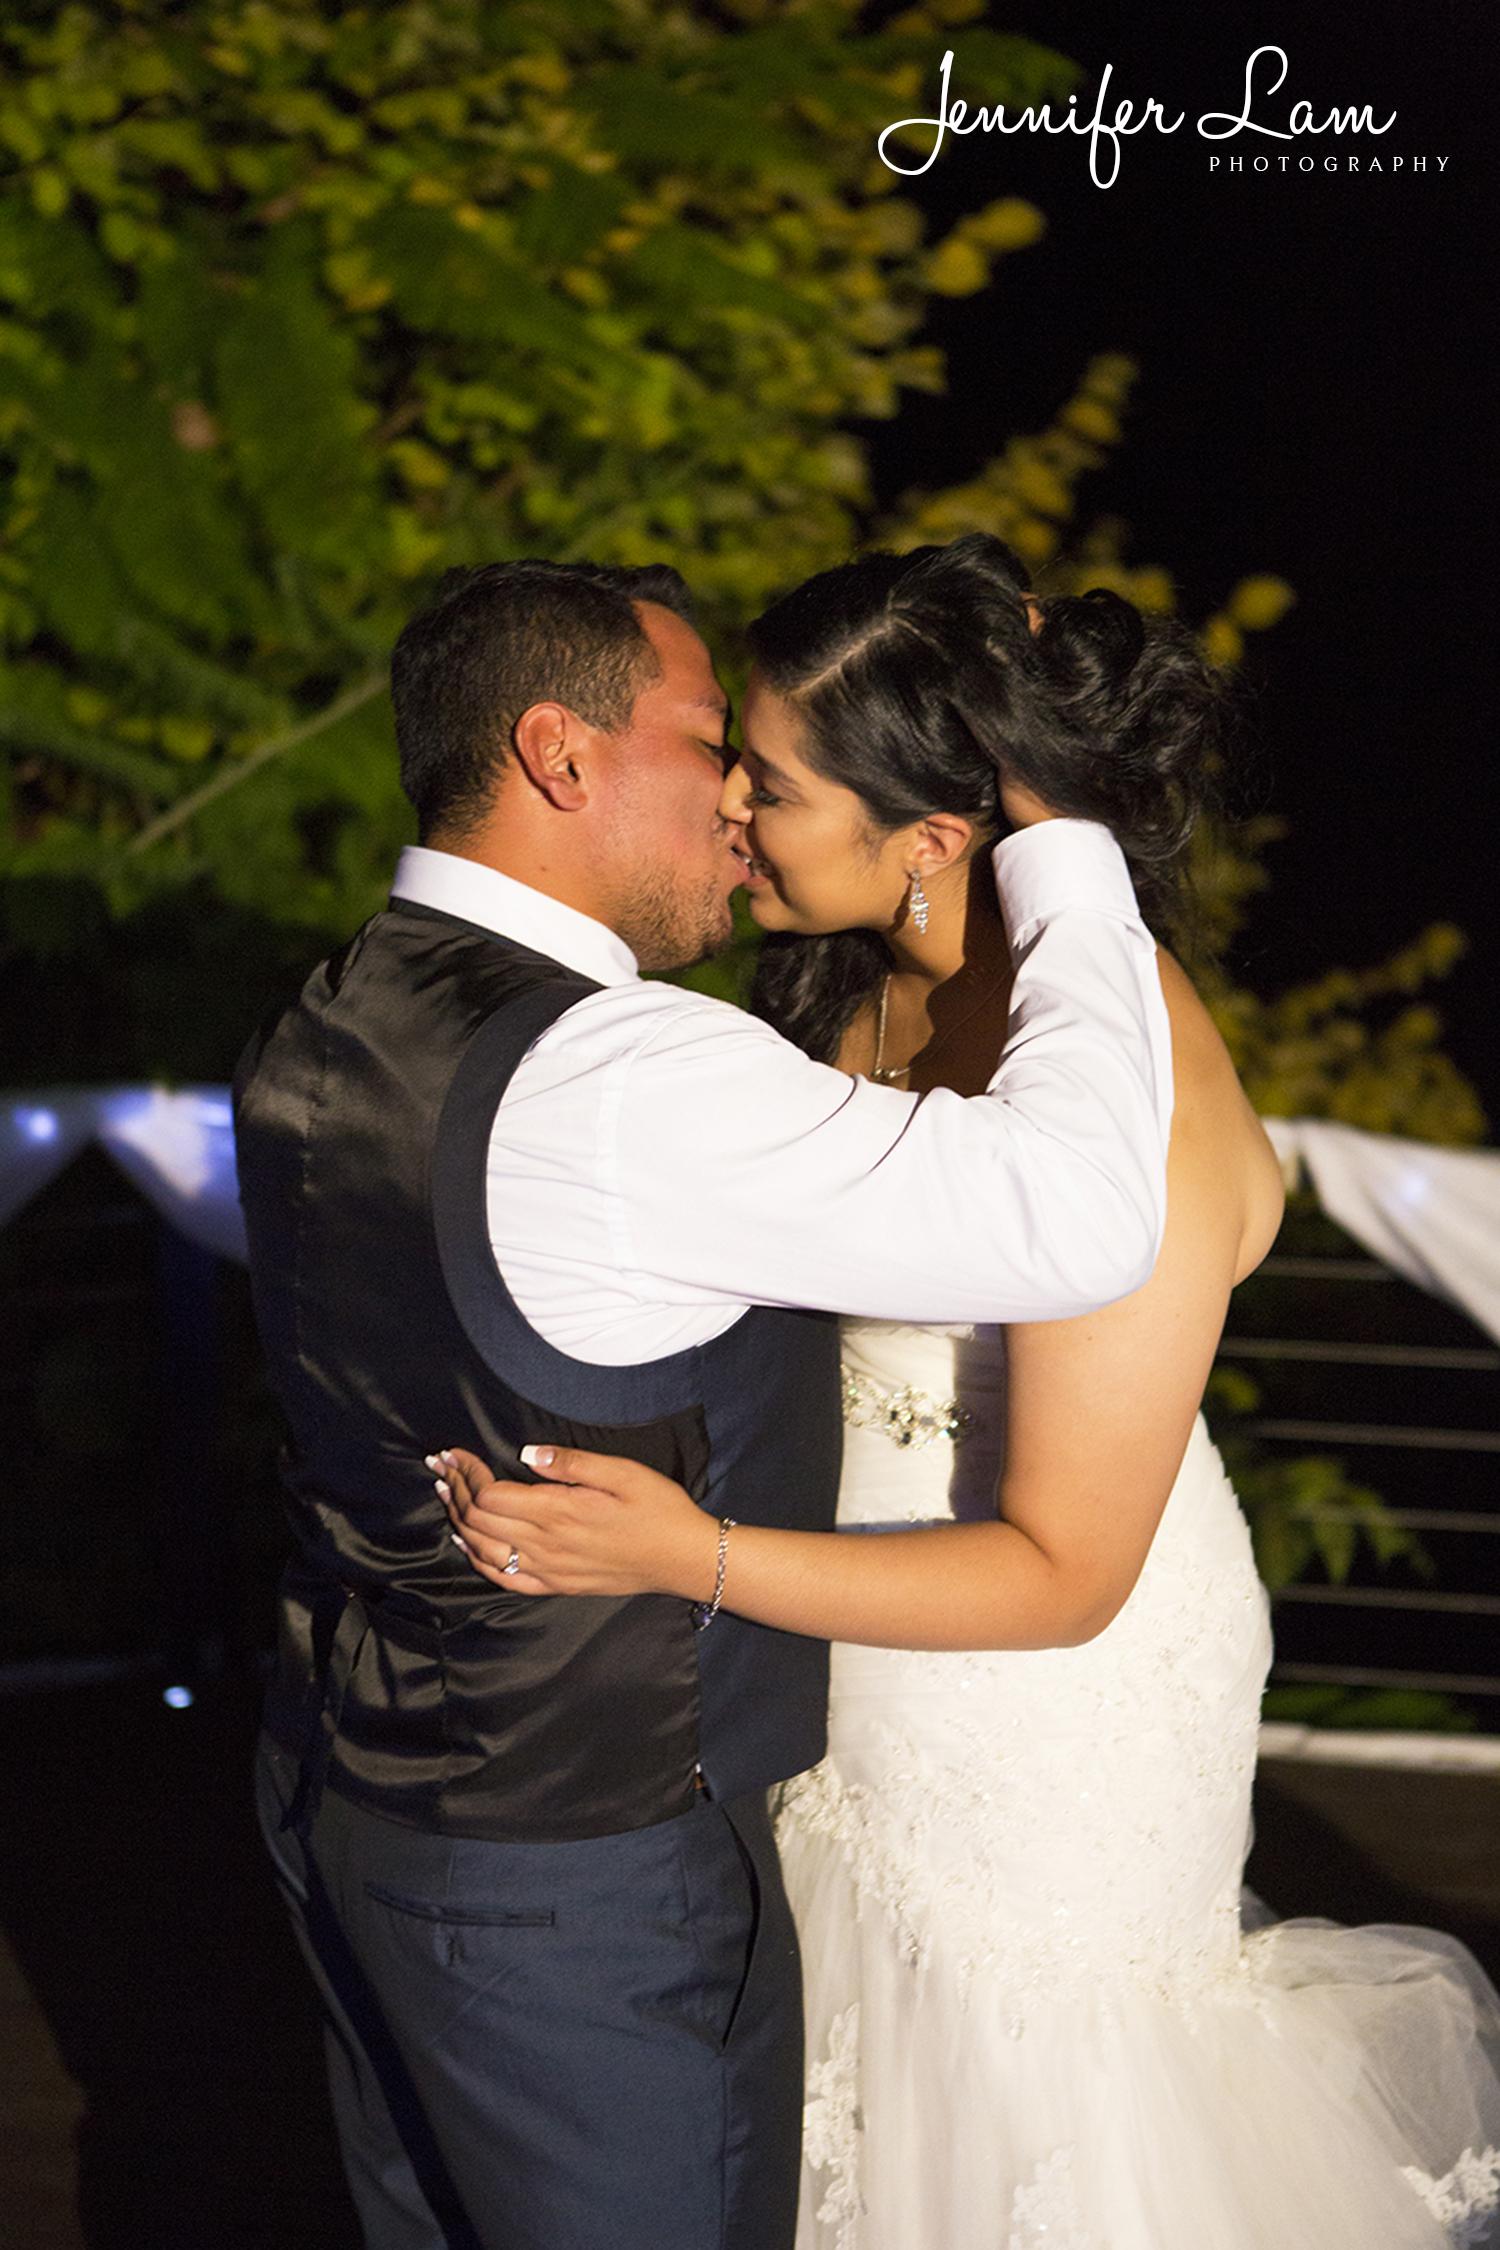 Sydney Wedding Photographer - Jennifer Lam Photography - www.jenniferlamphotography (106).jpg